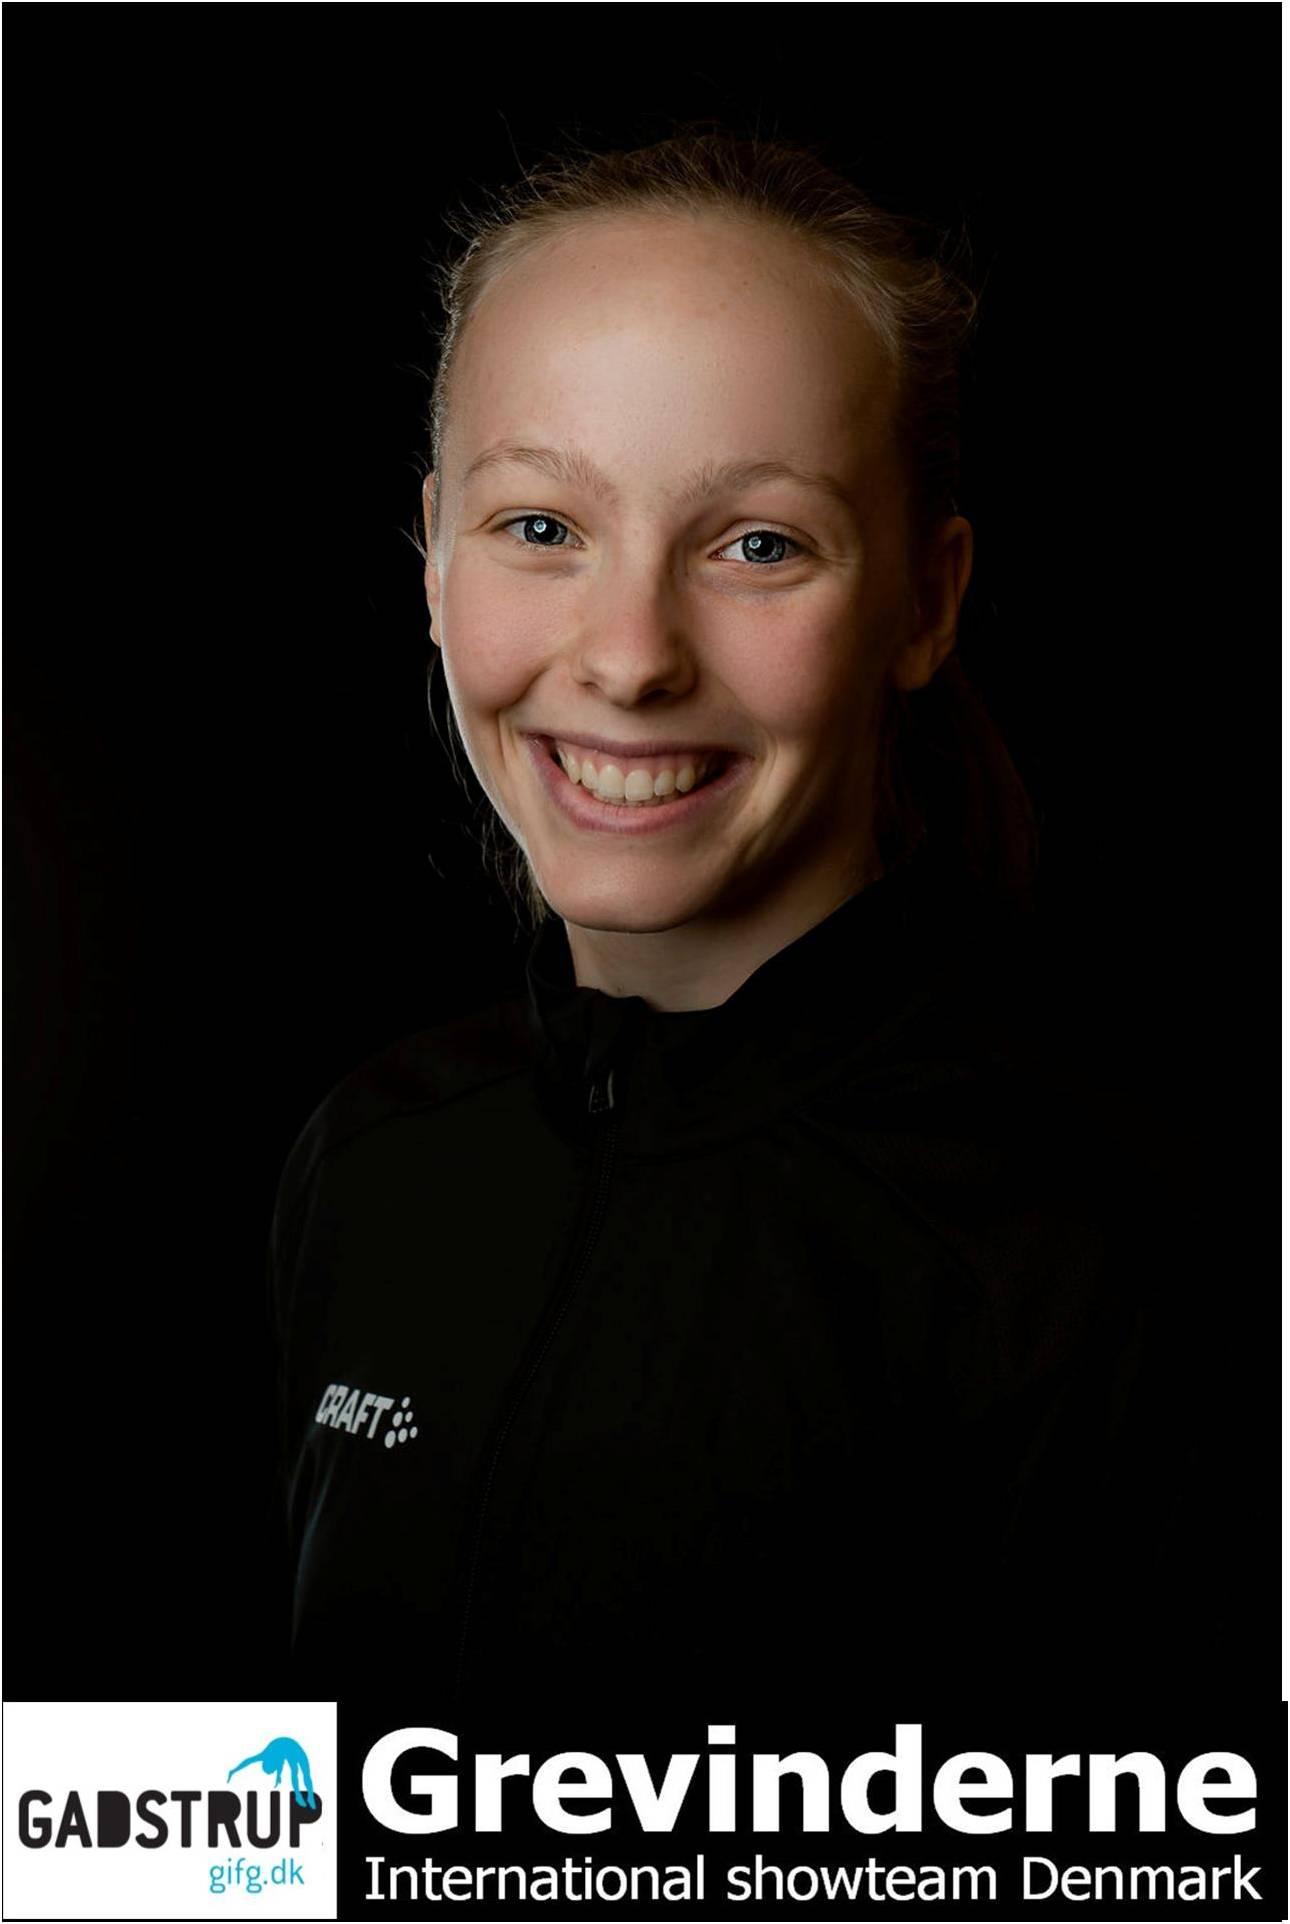 Caroline Busk Andersen